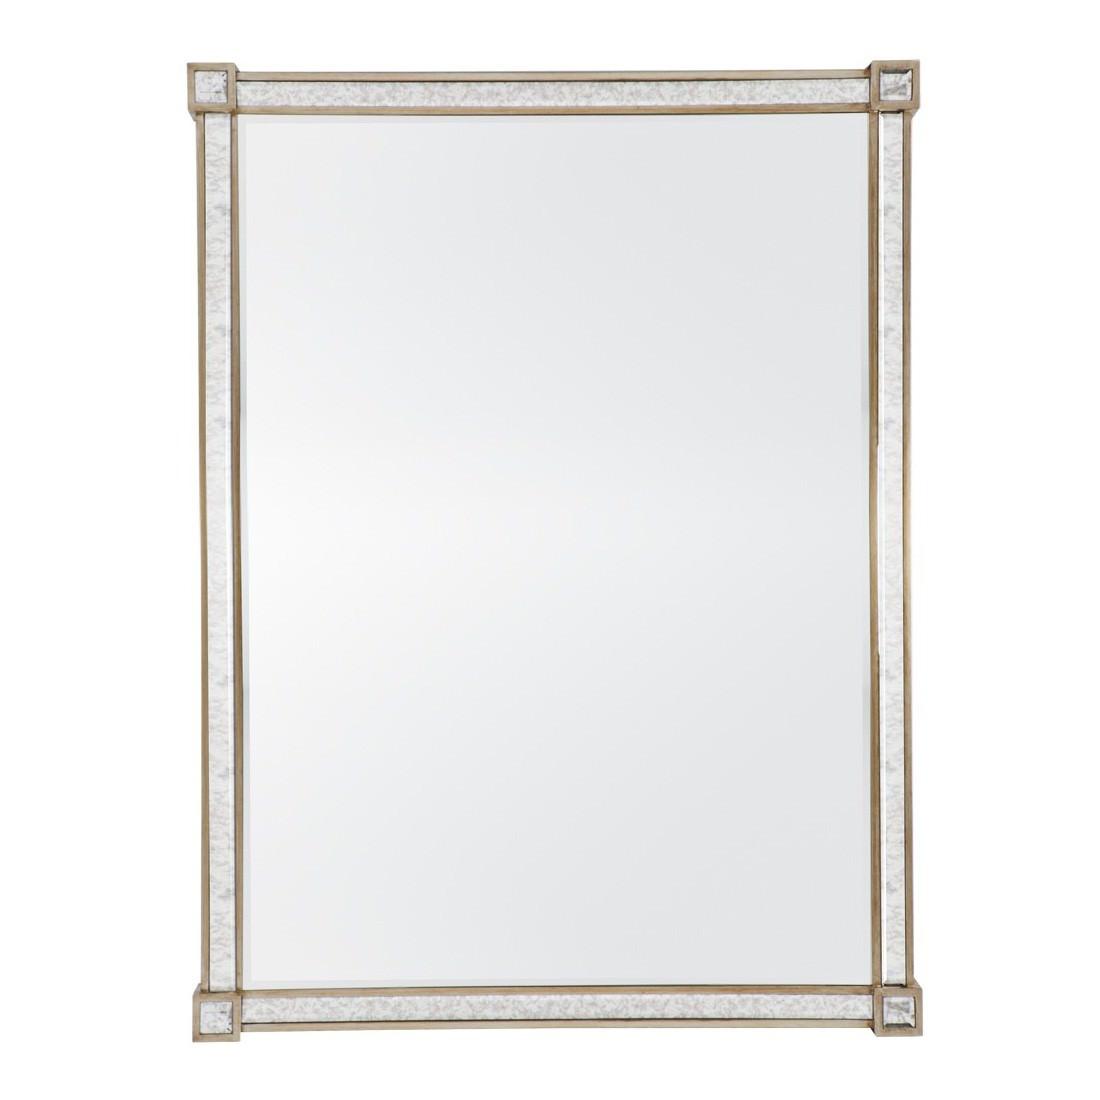 Cocktail Wall Mirror, 120cm